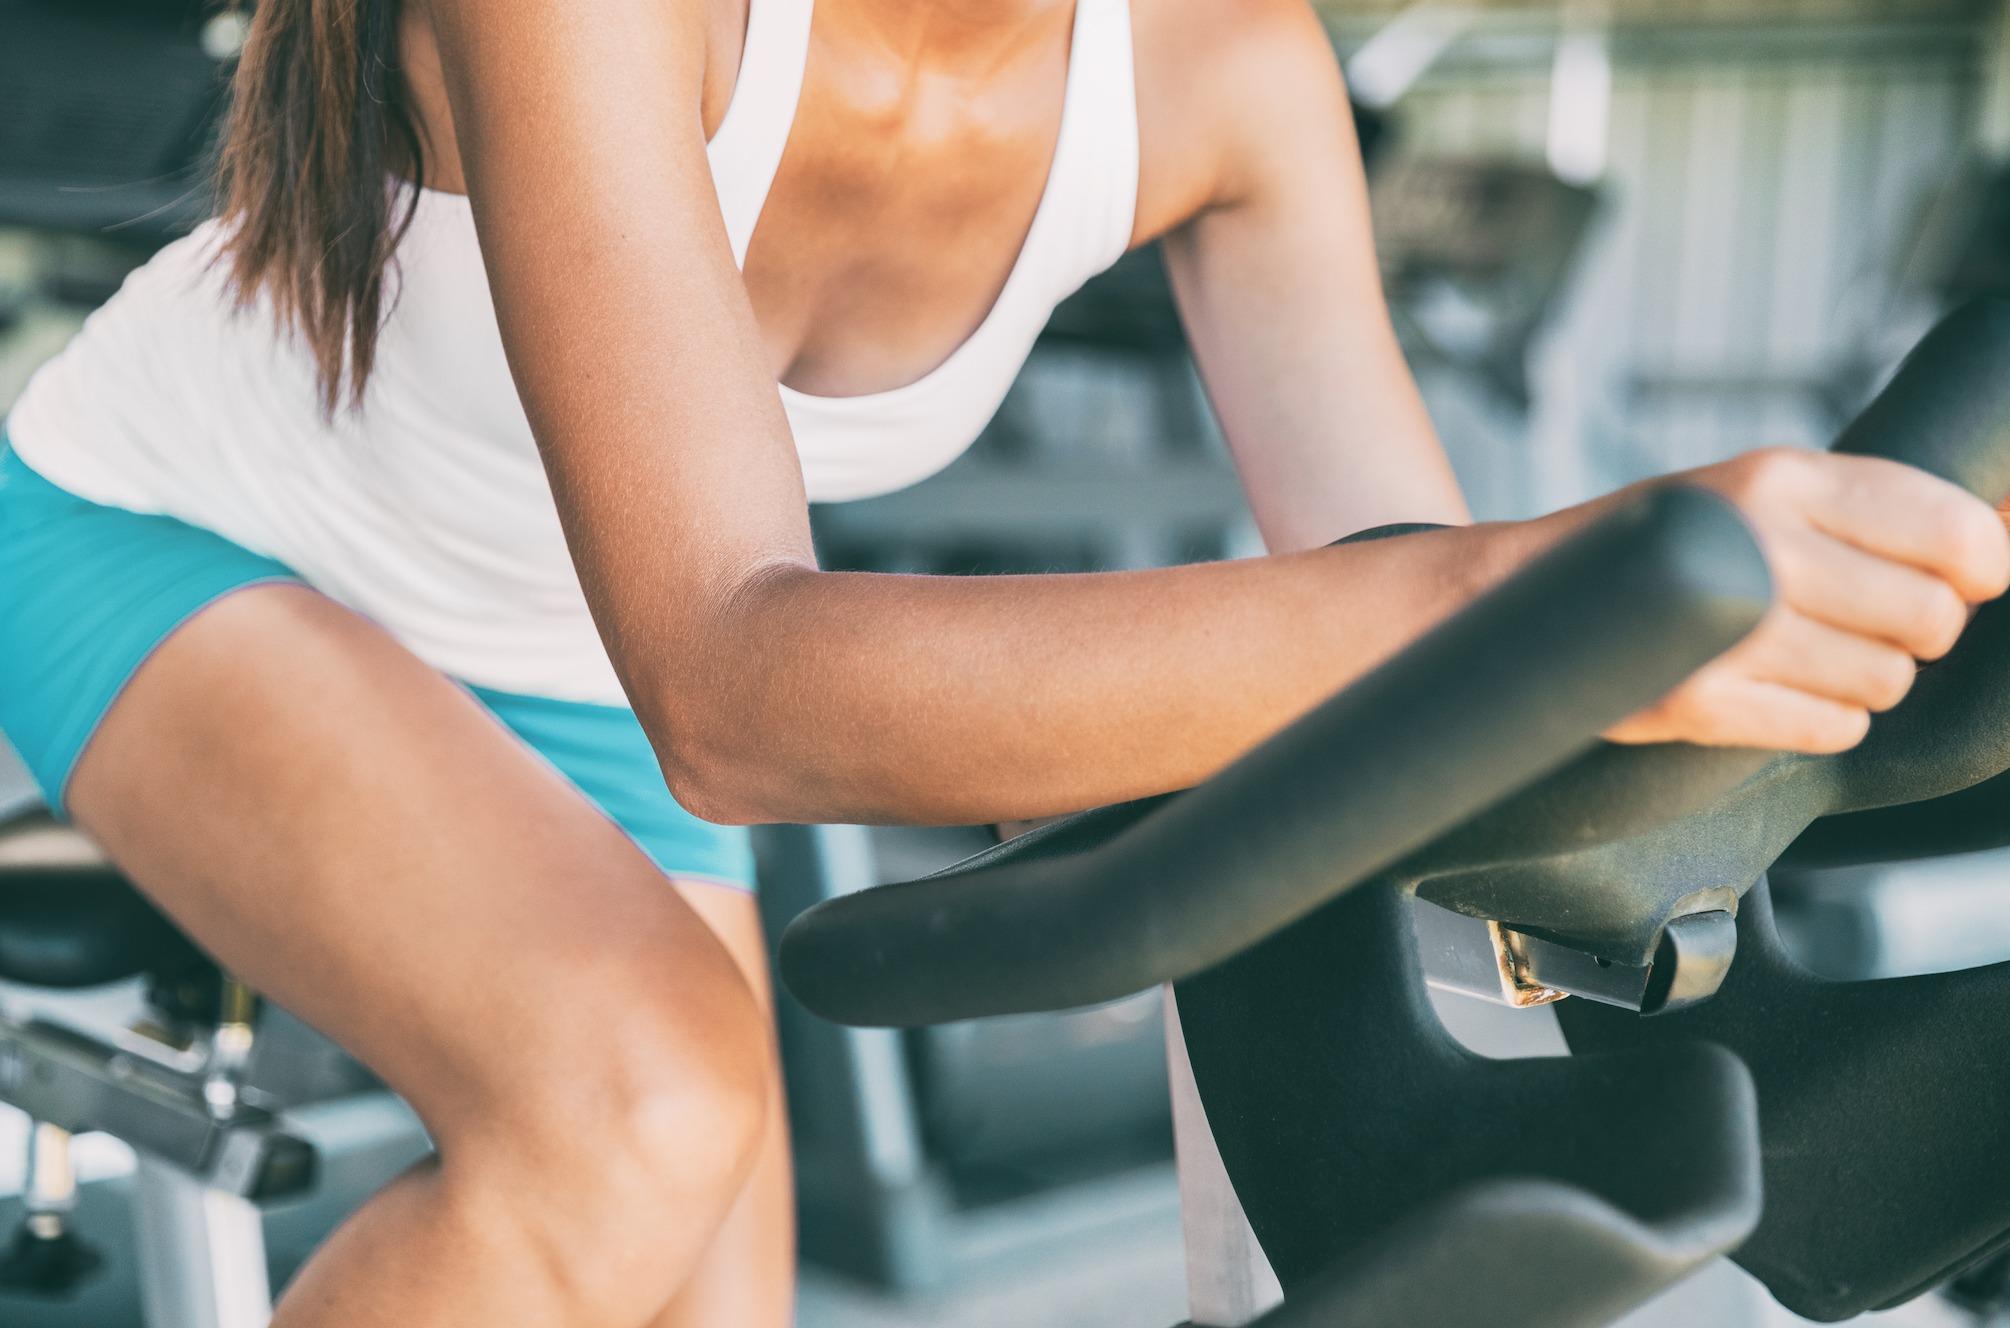 asuna 7150 minotaur exercise bike review